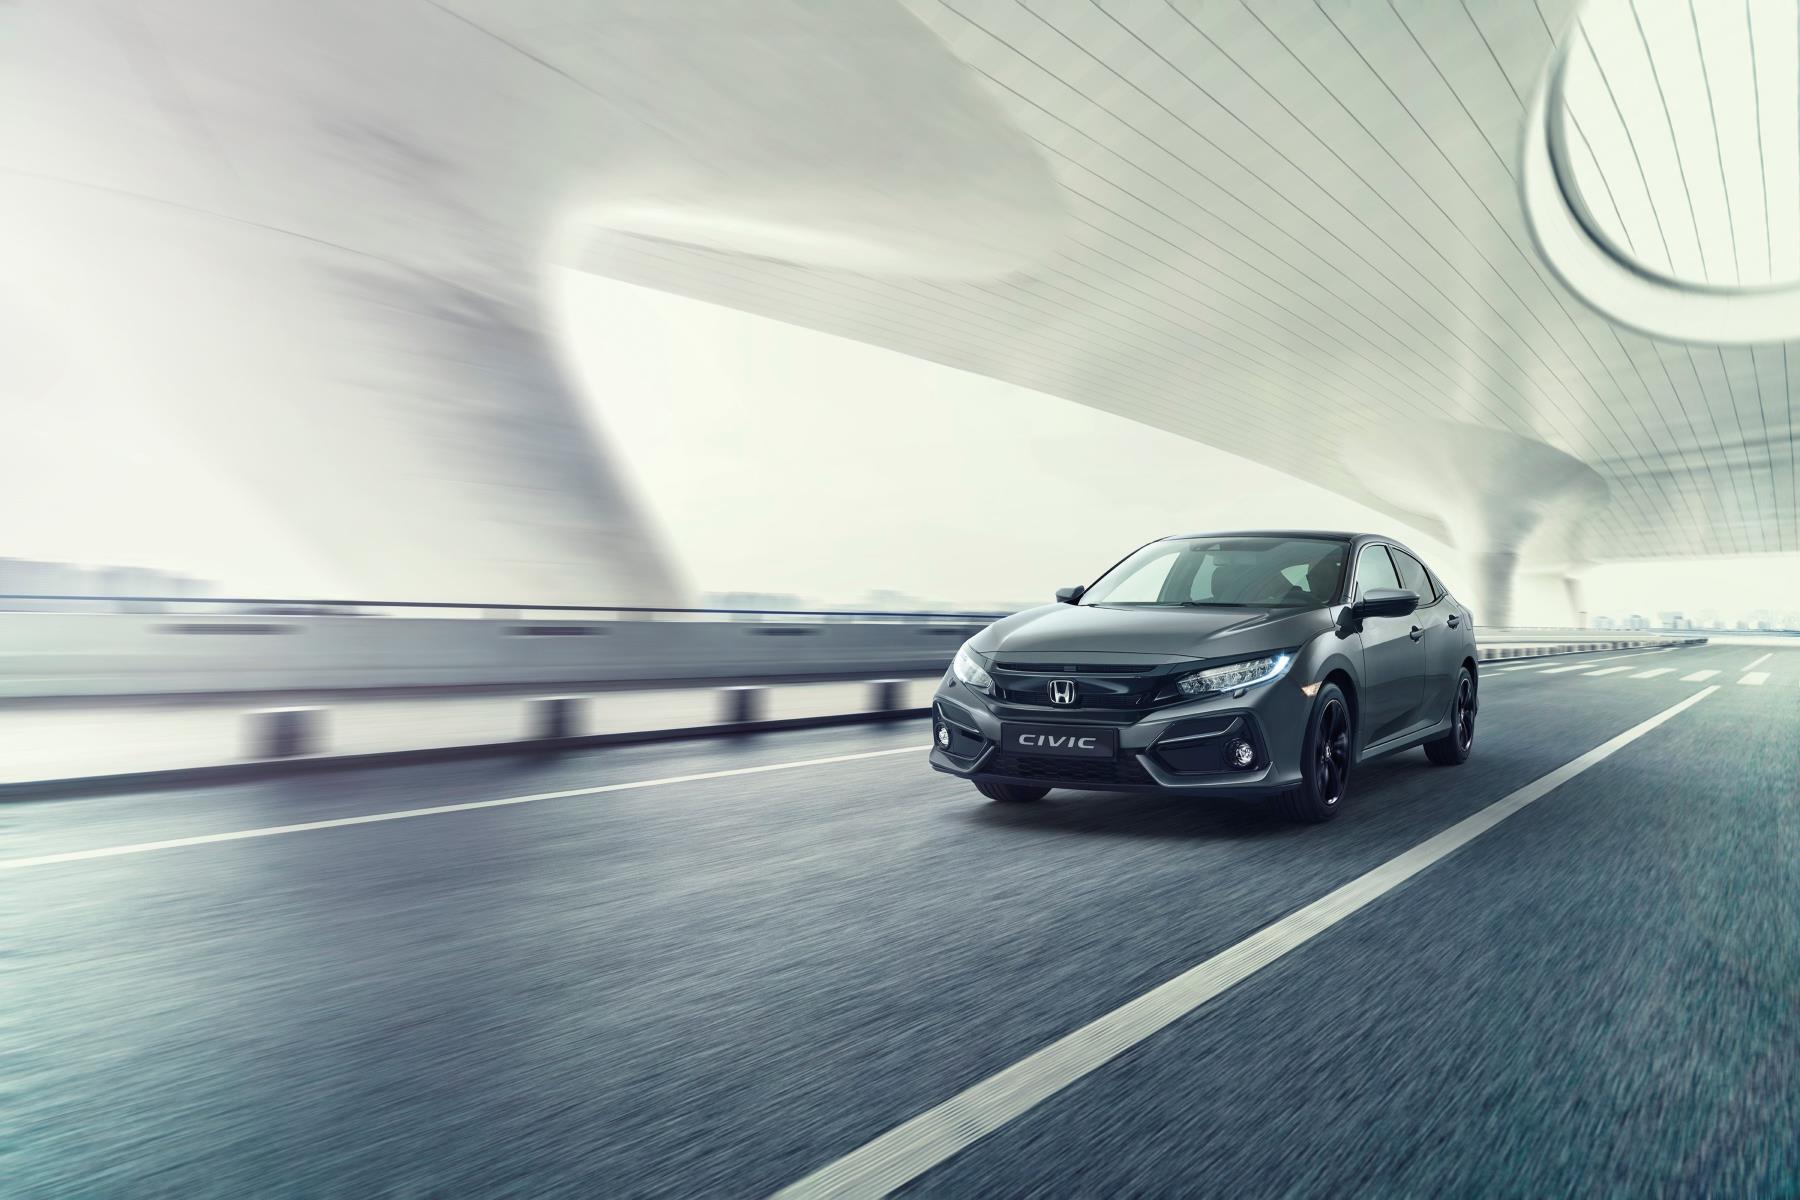 Honda Civic facelift exterior